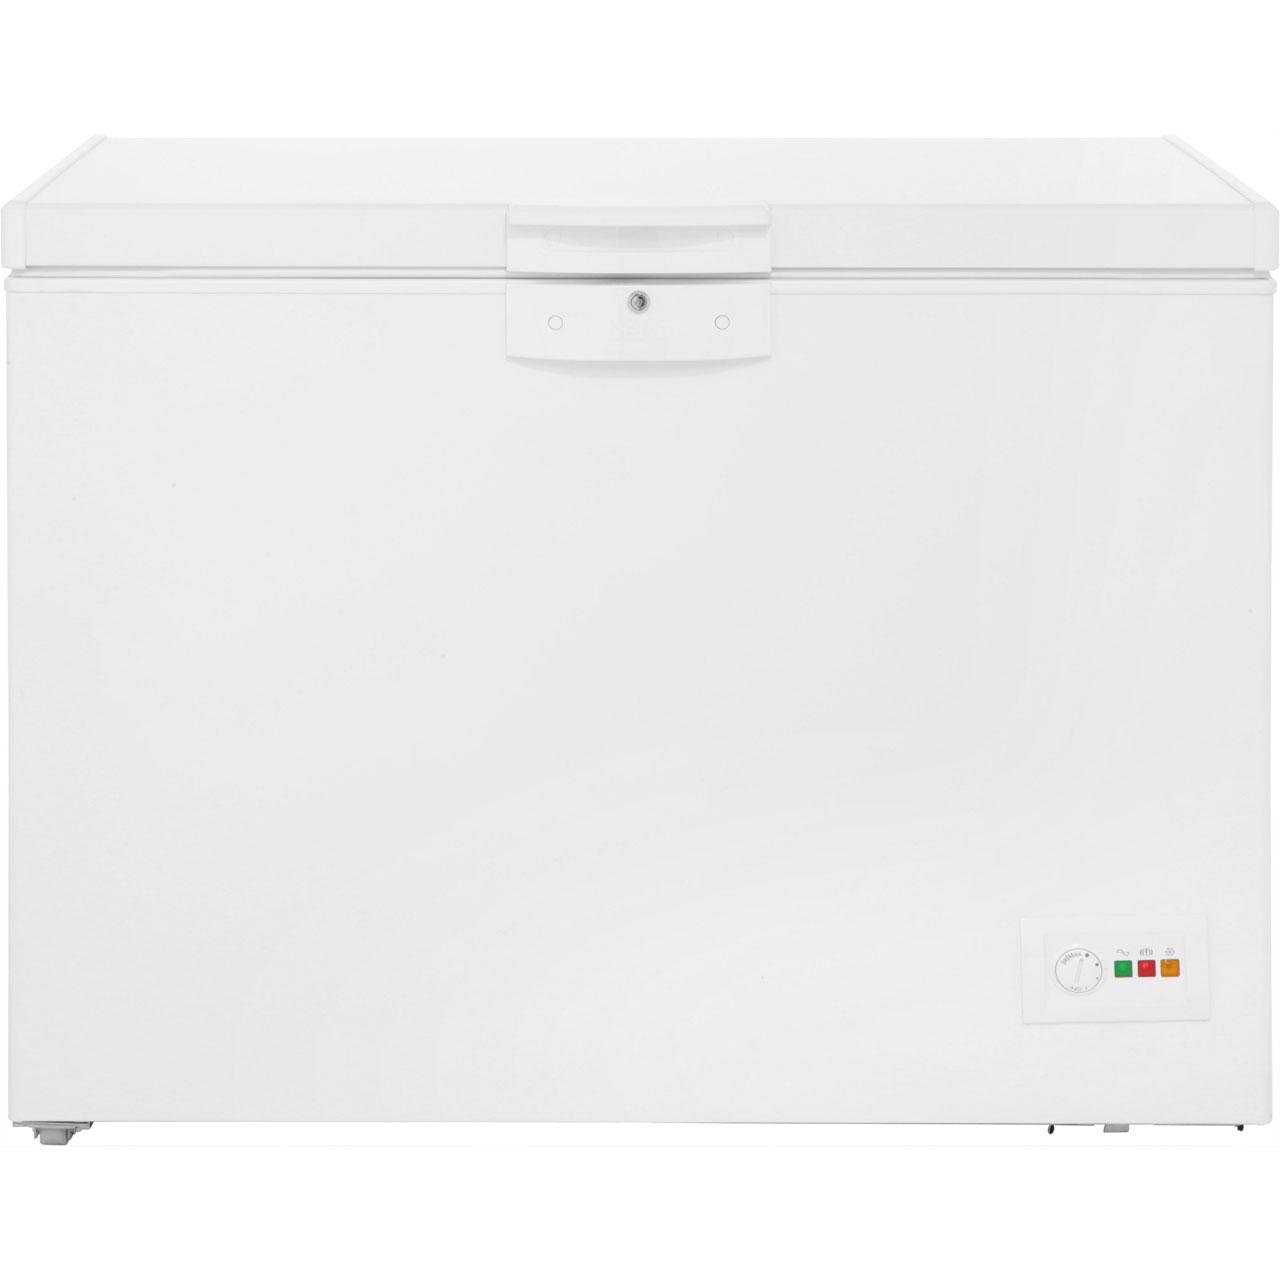 Beko CF1100APW Free Standing Chest Freezer in White